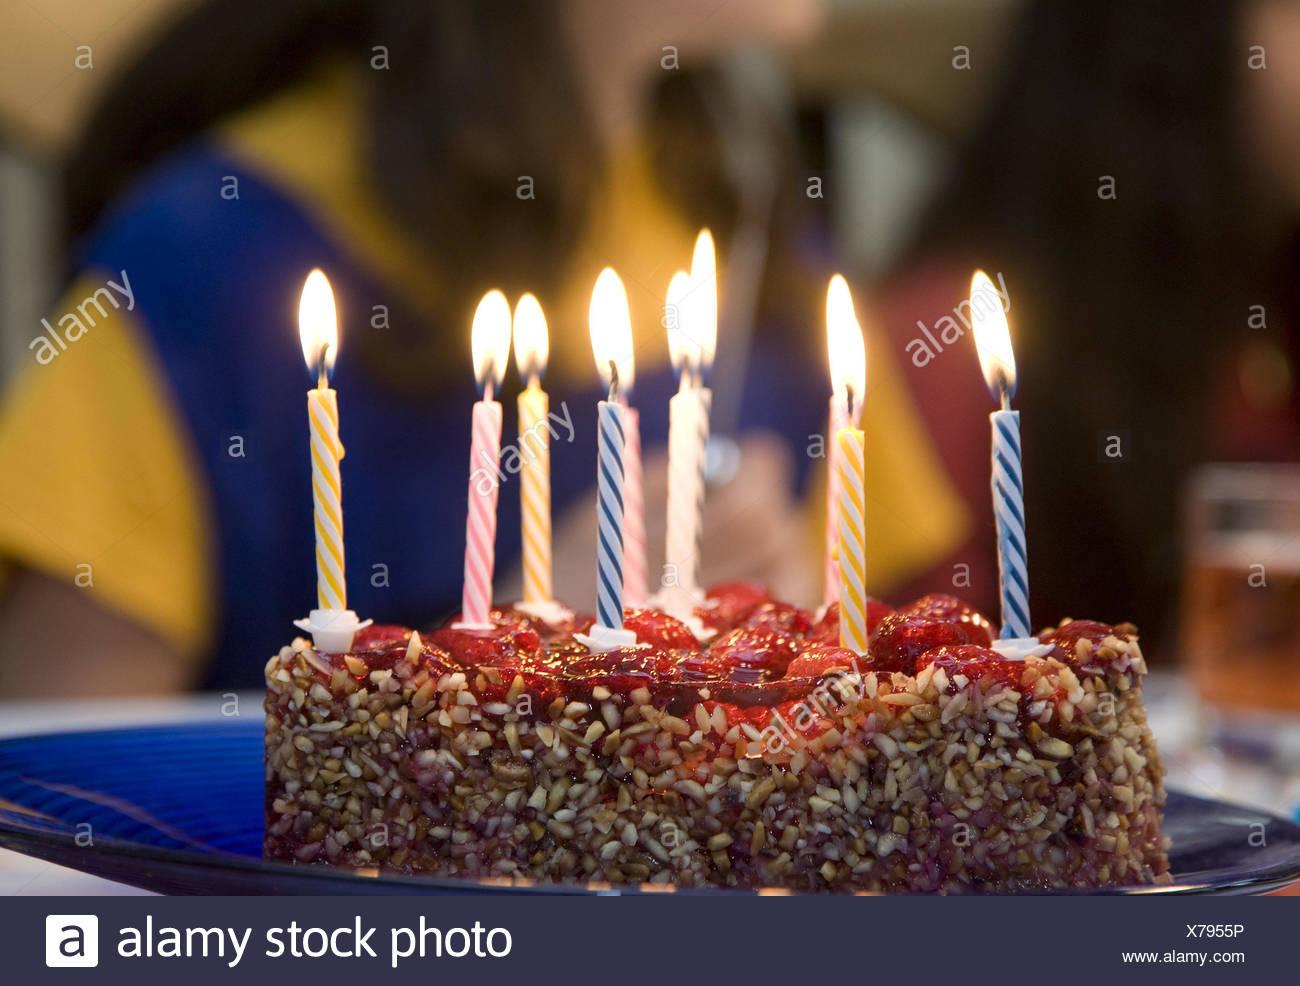 Geburtstagstorte Kerzen Hell Brennen Kindergeburtstag